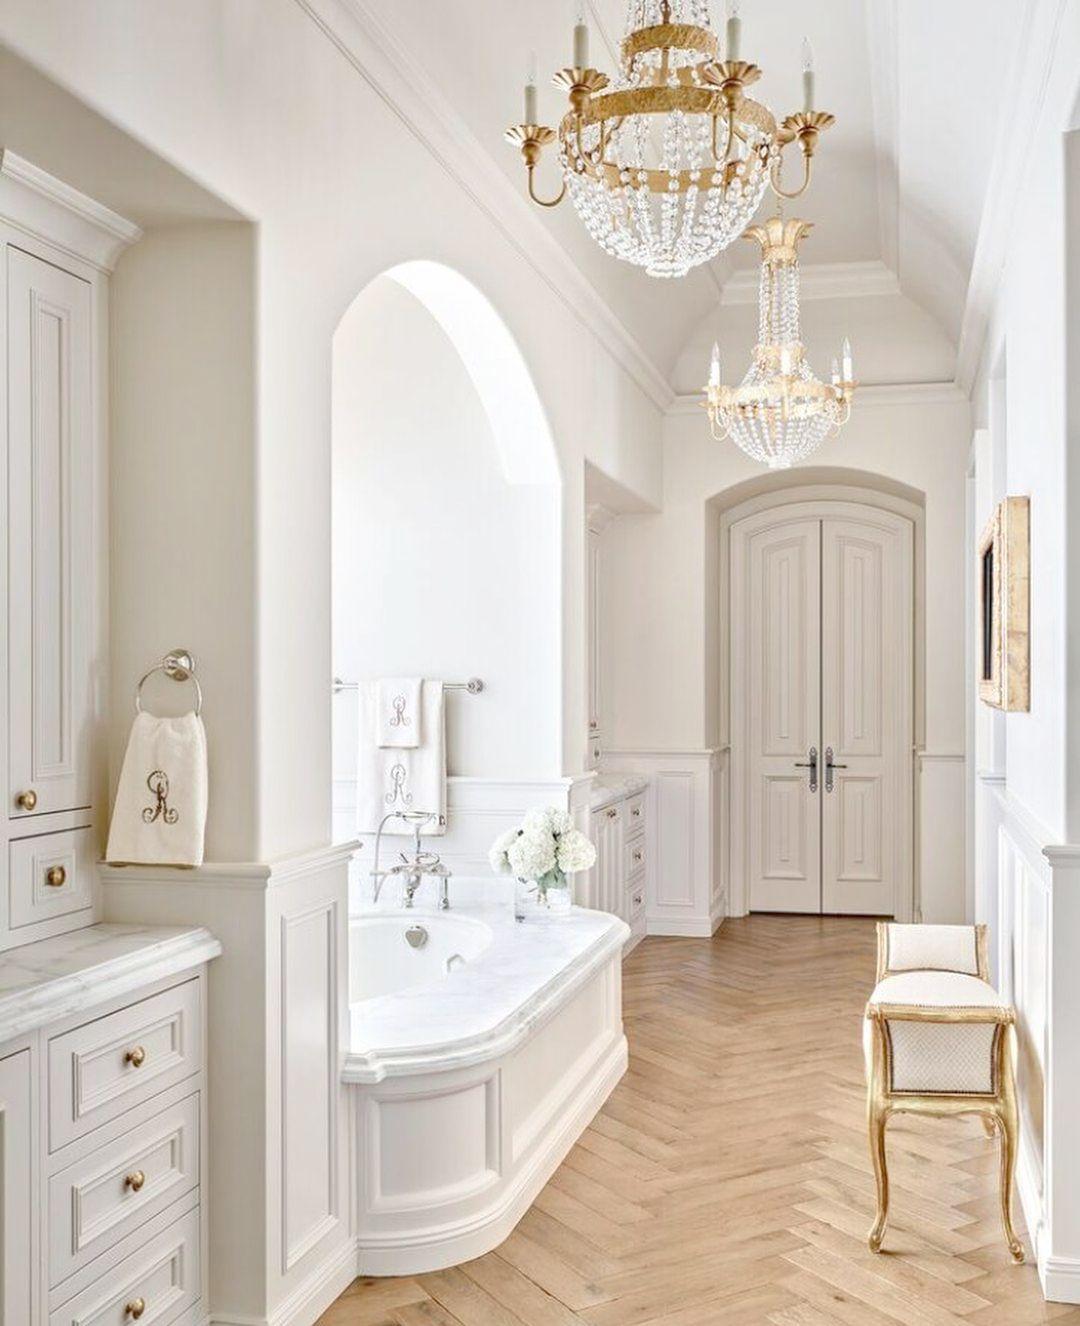 Luxury Bathrooms Liverpool Elegant Bathrooms Ideas | Top Luxury ...